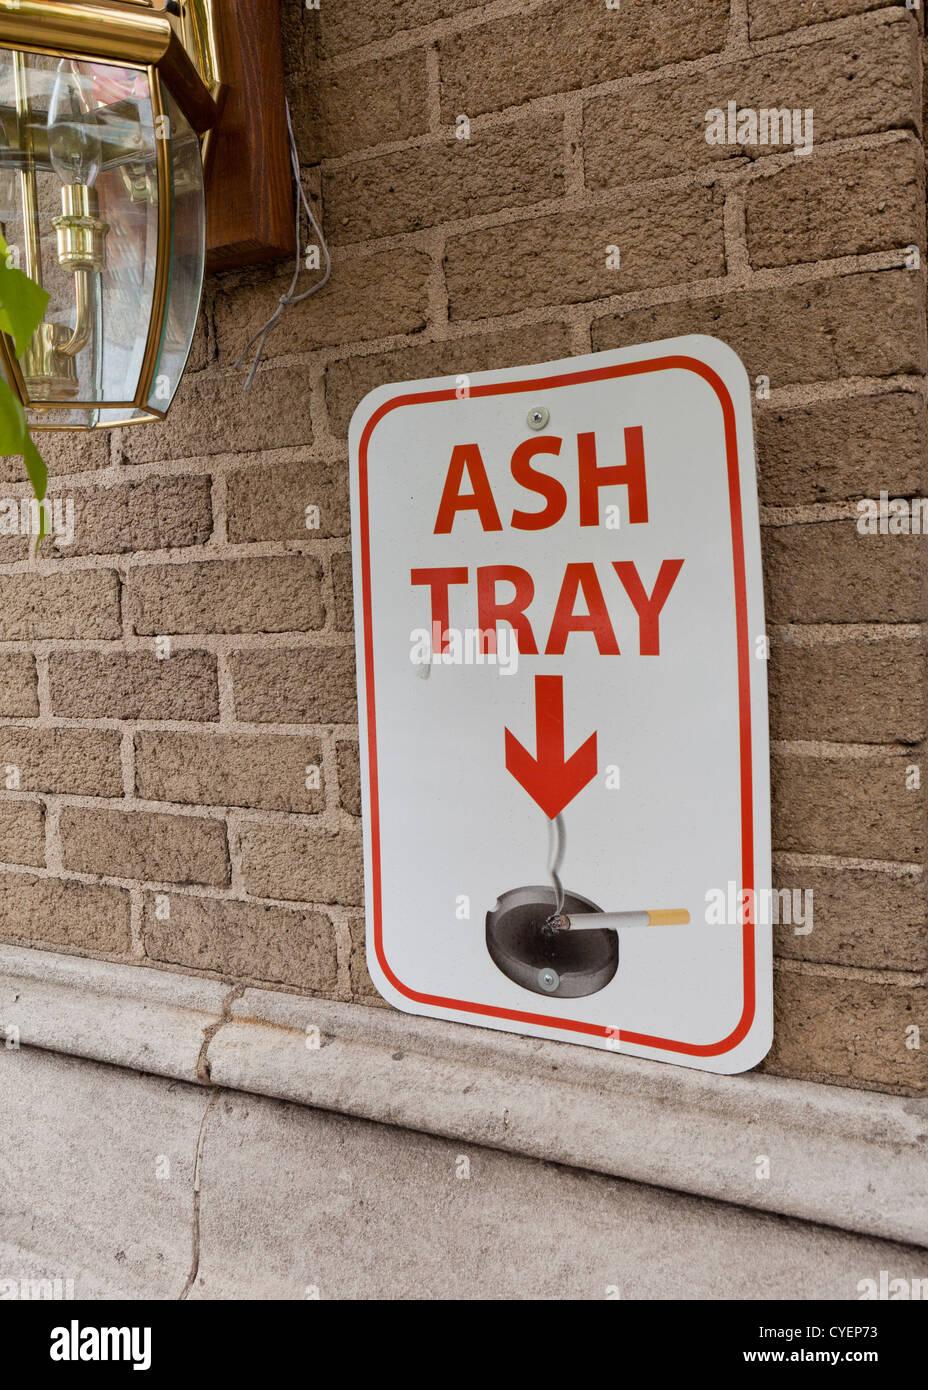 Ash tray sign - Stock Image